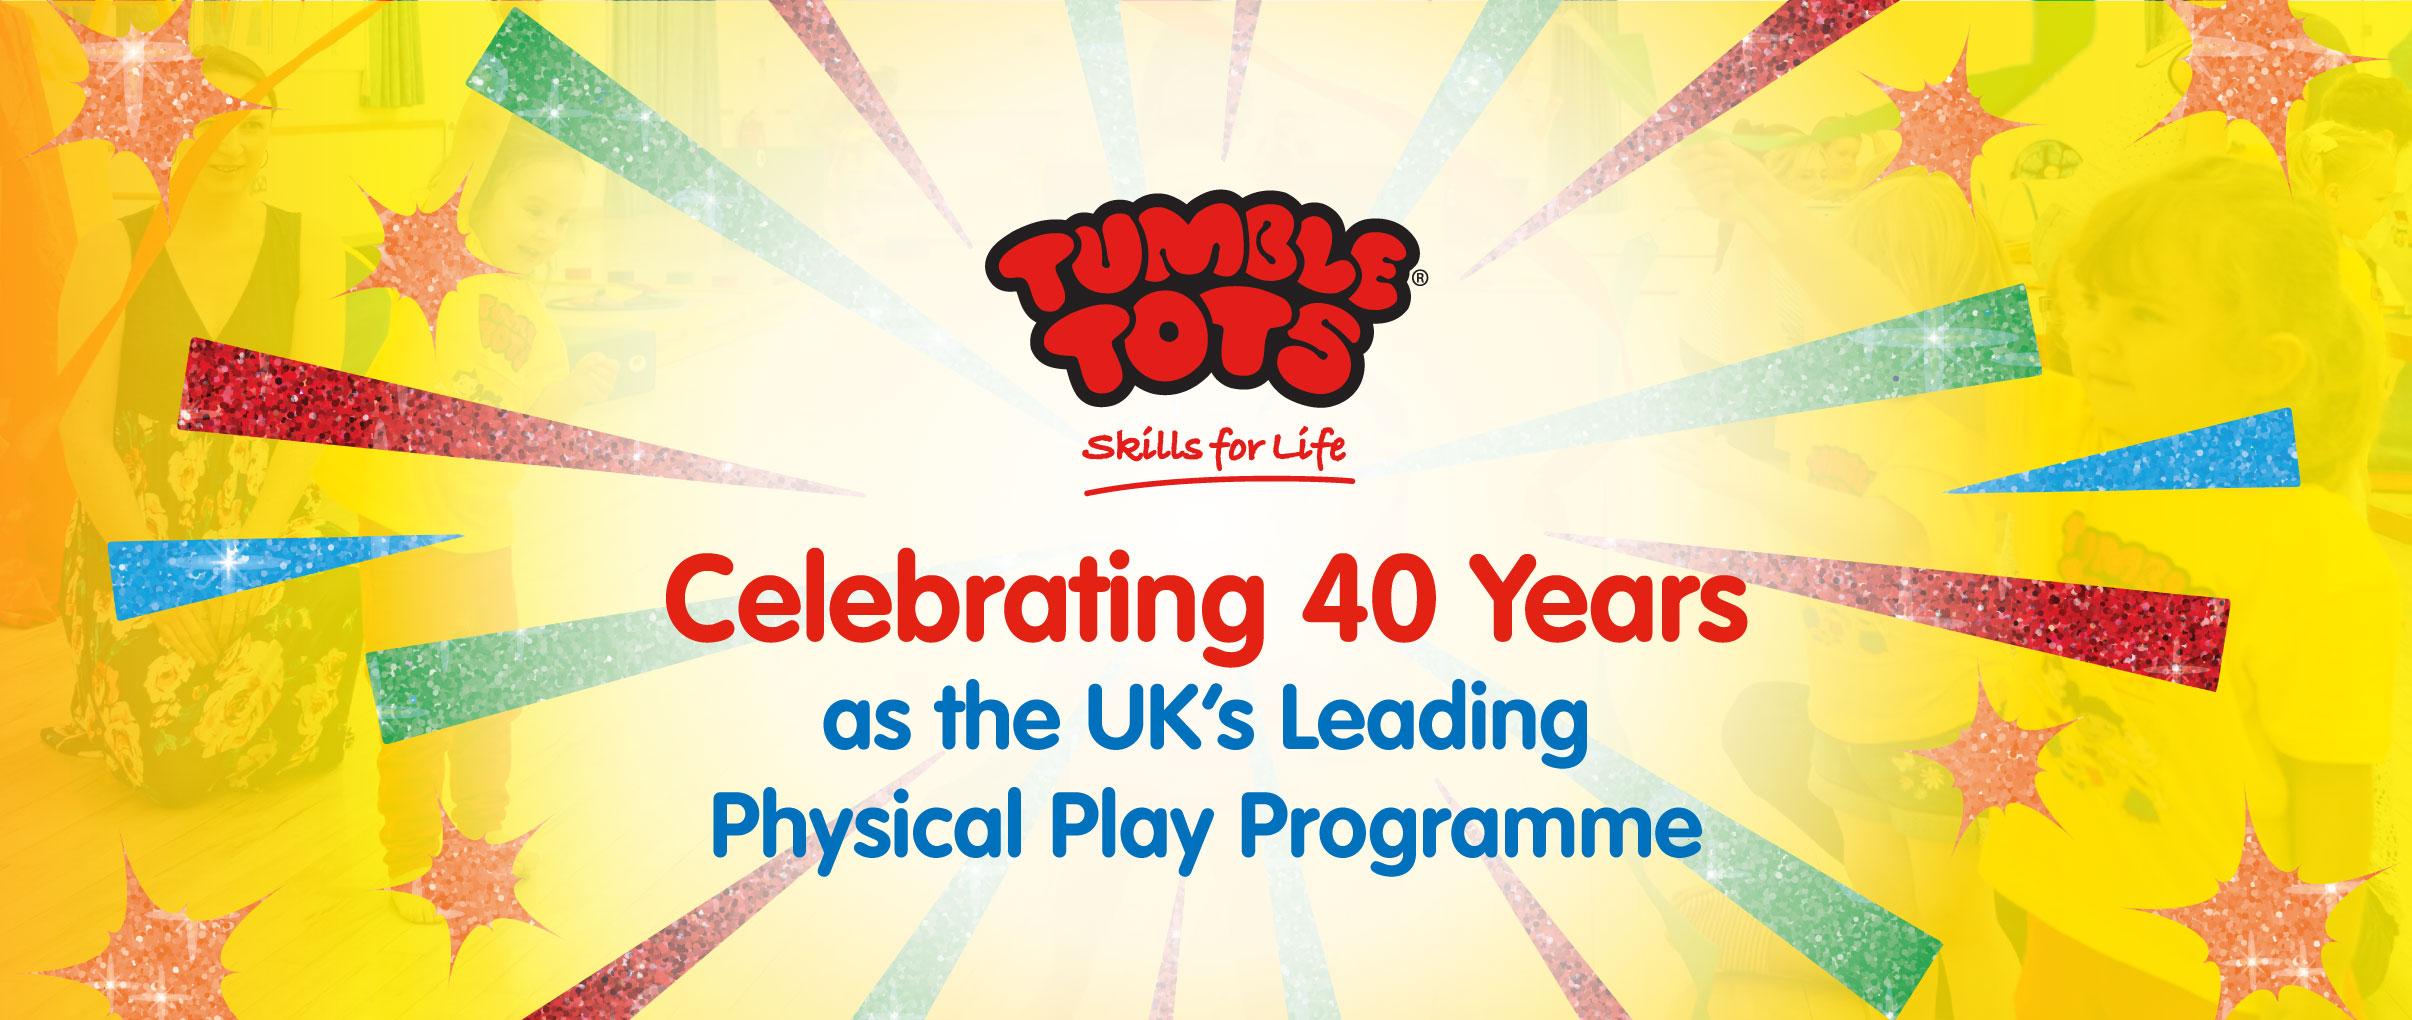 Tumble Tots Aylesbury, Arncott, Berkhamsted, Steeple Clayon, Thame's main image